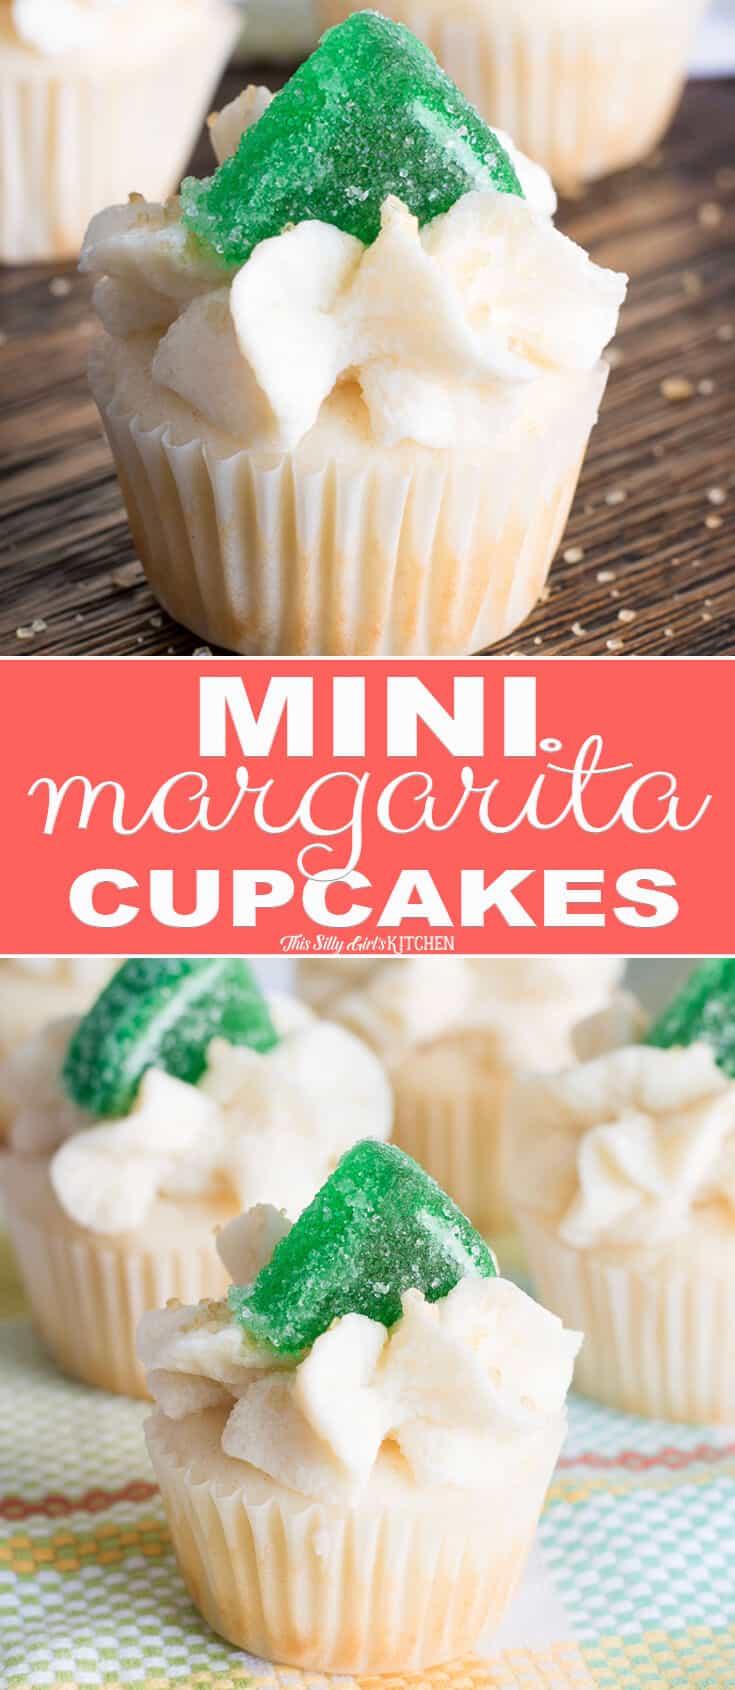 Mini Margarita Cupcakes, festive bite-sized cupcakes with margarita flavors! #Recipe from ThisSillyGirlsKitchen.com #cupcakes #margarita #margaritacupcakes